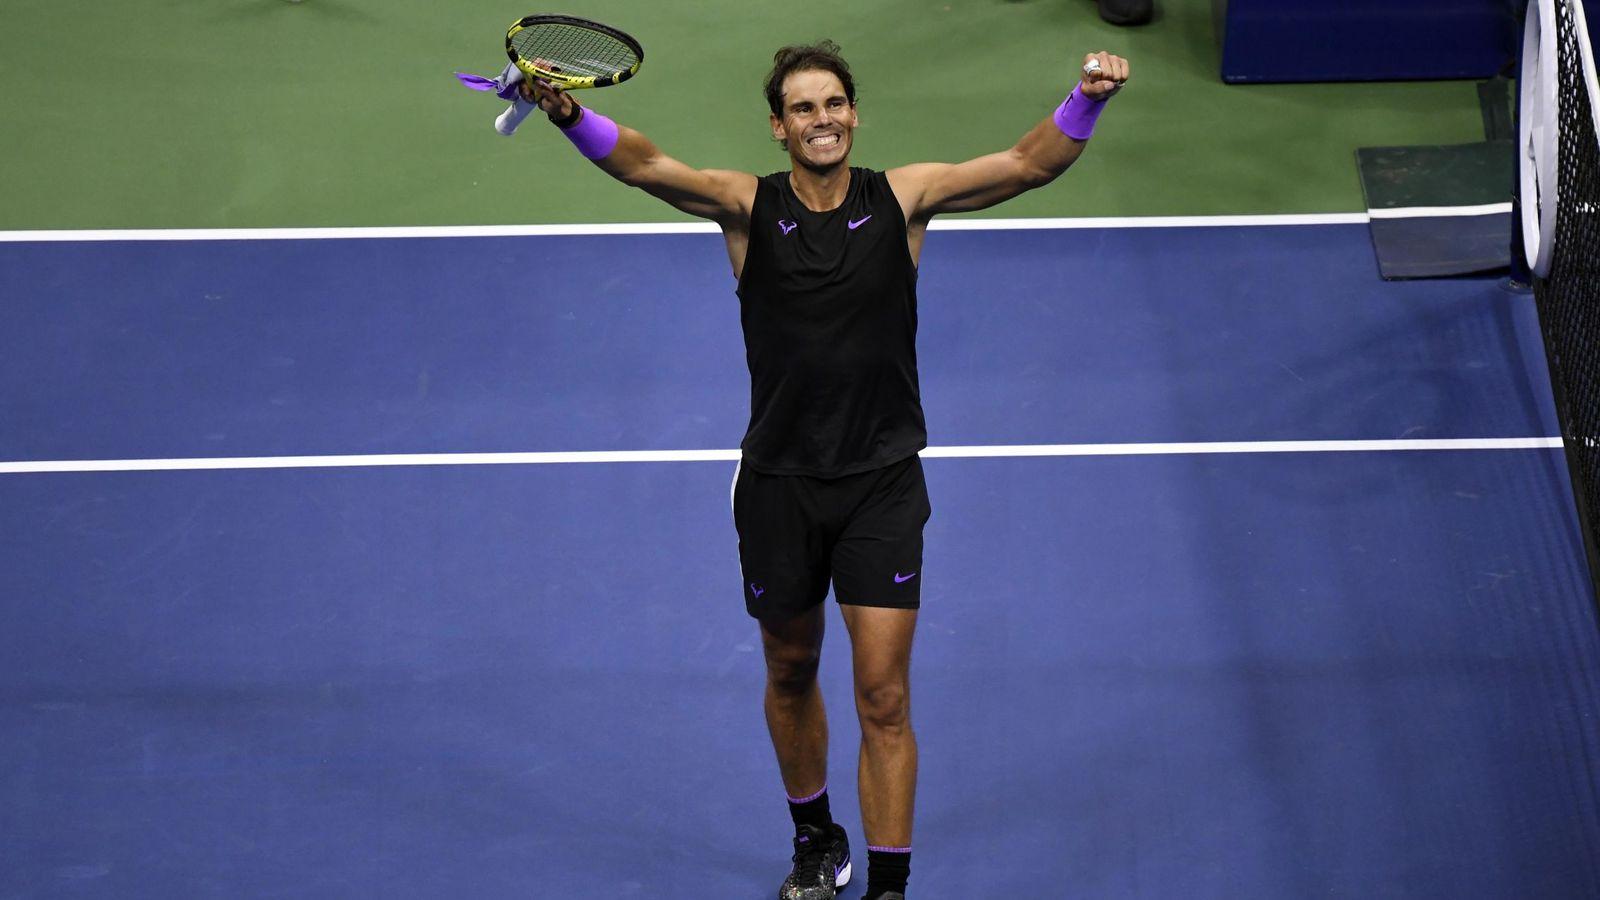 Foto: Rafa Nadal celebra su clasificación para la final del US Open. (USA TODAY Sports)